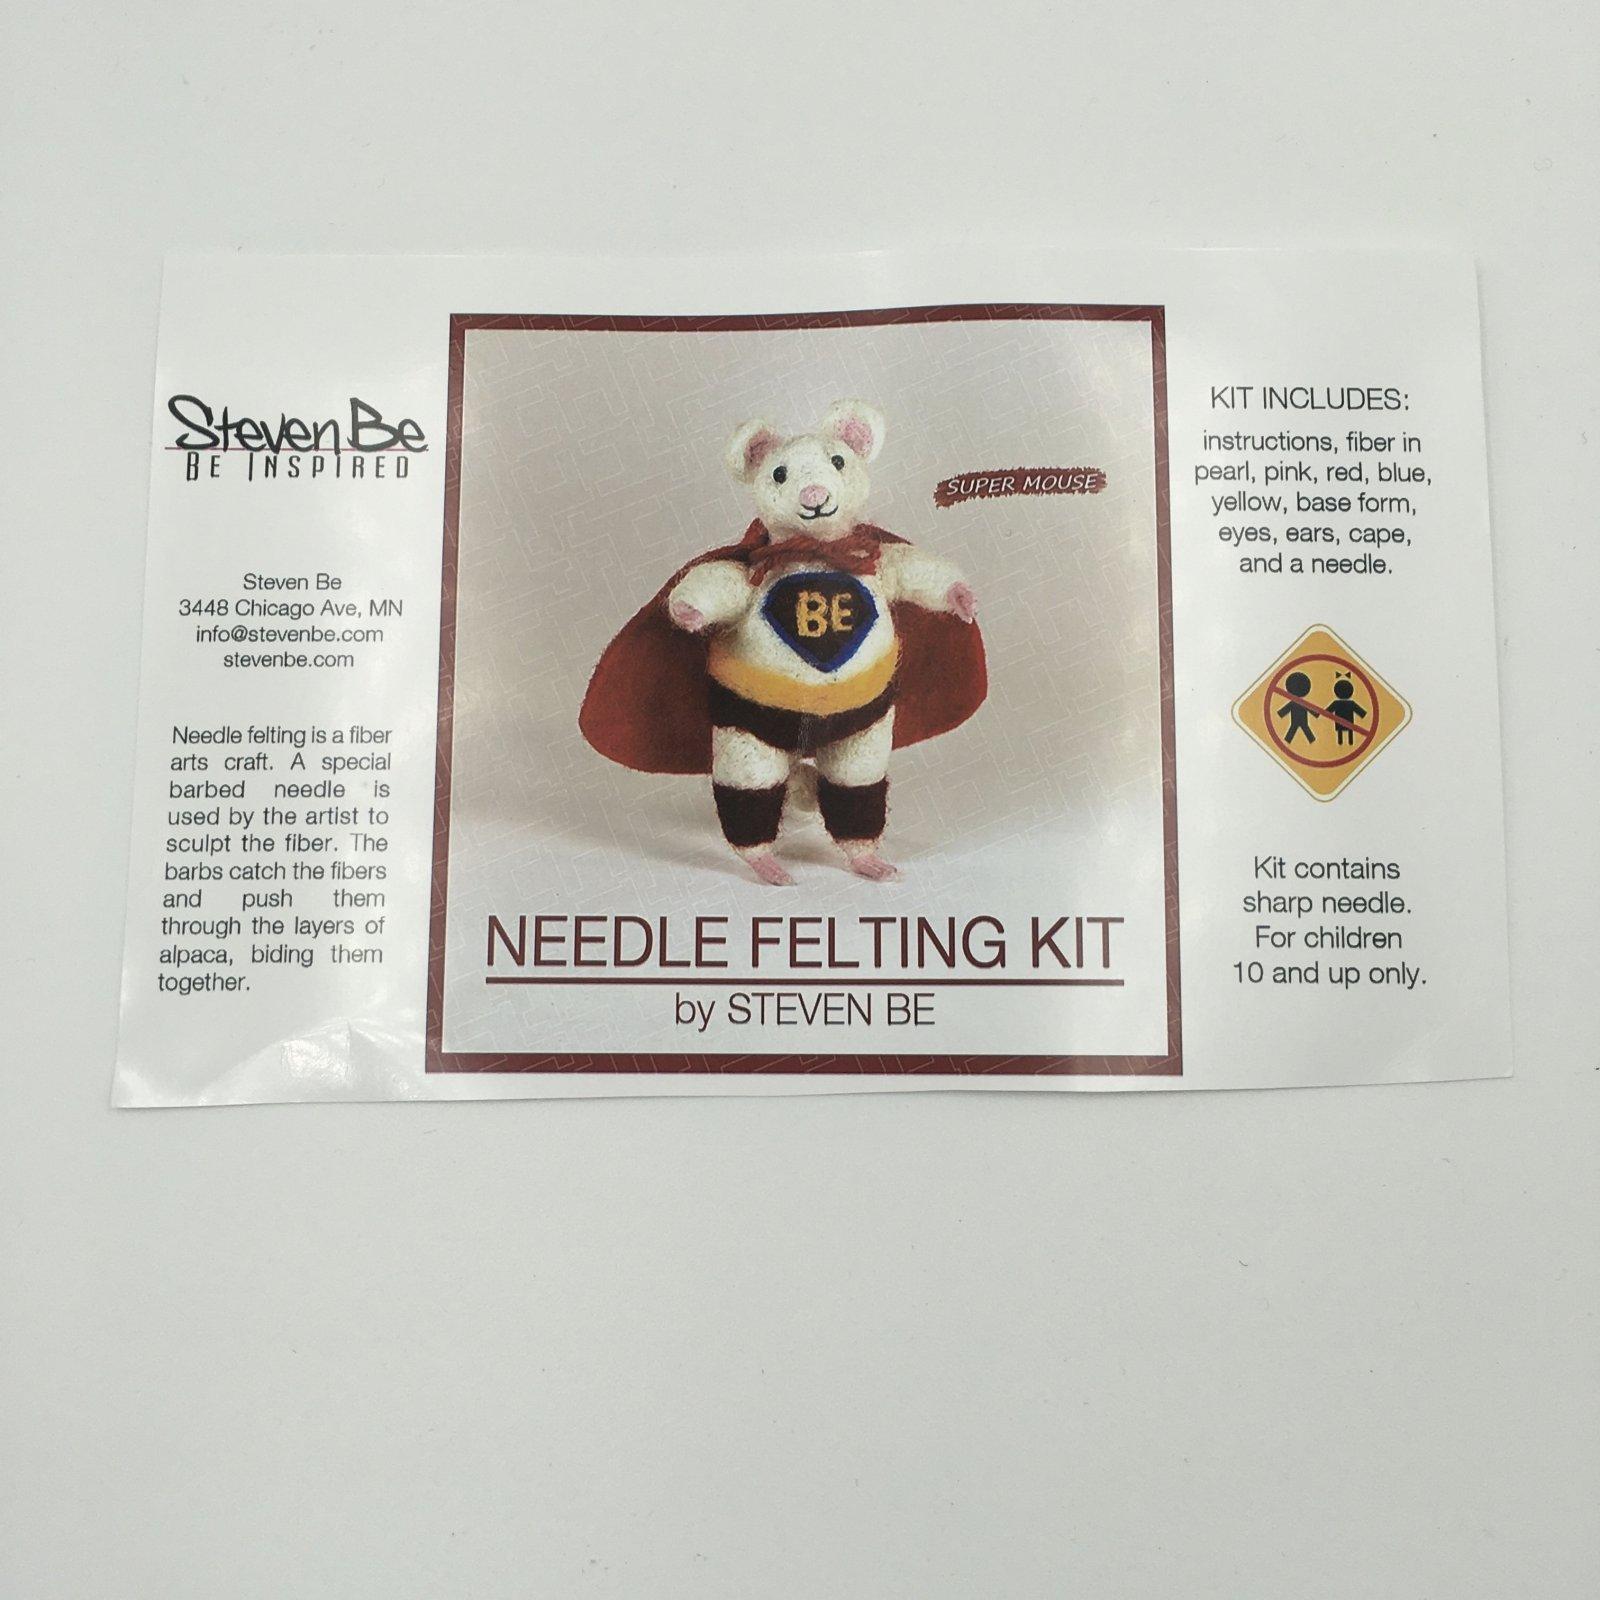 StevenBe Needle Felting Kit - Super Mouse